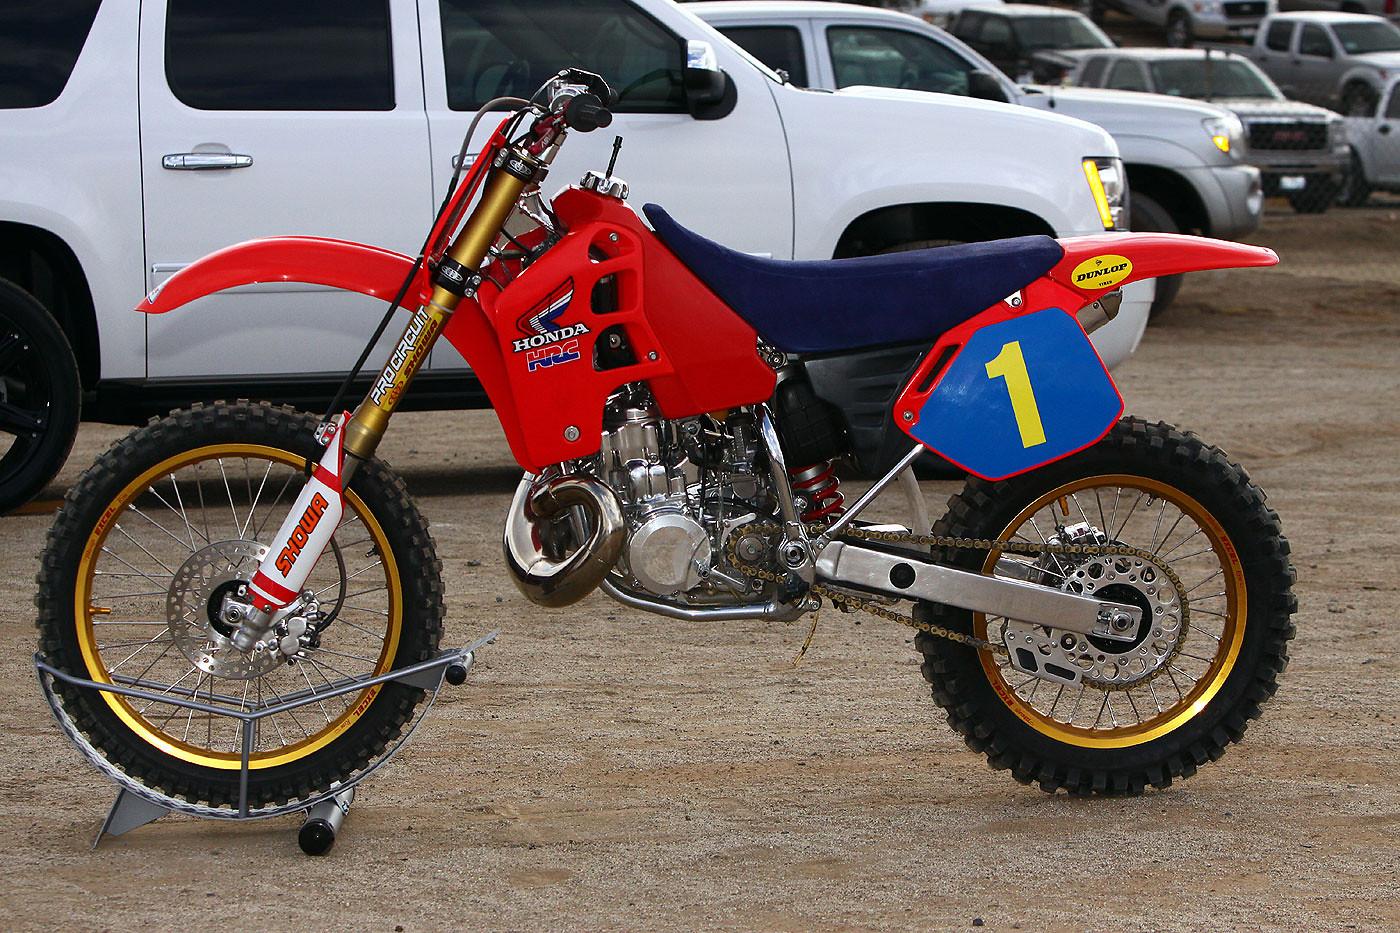 Ez stand - Mad Racing Mx - Motocross Pictures - Vital MX